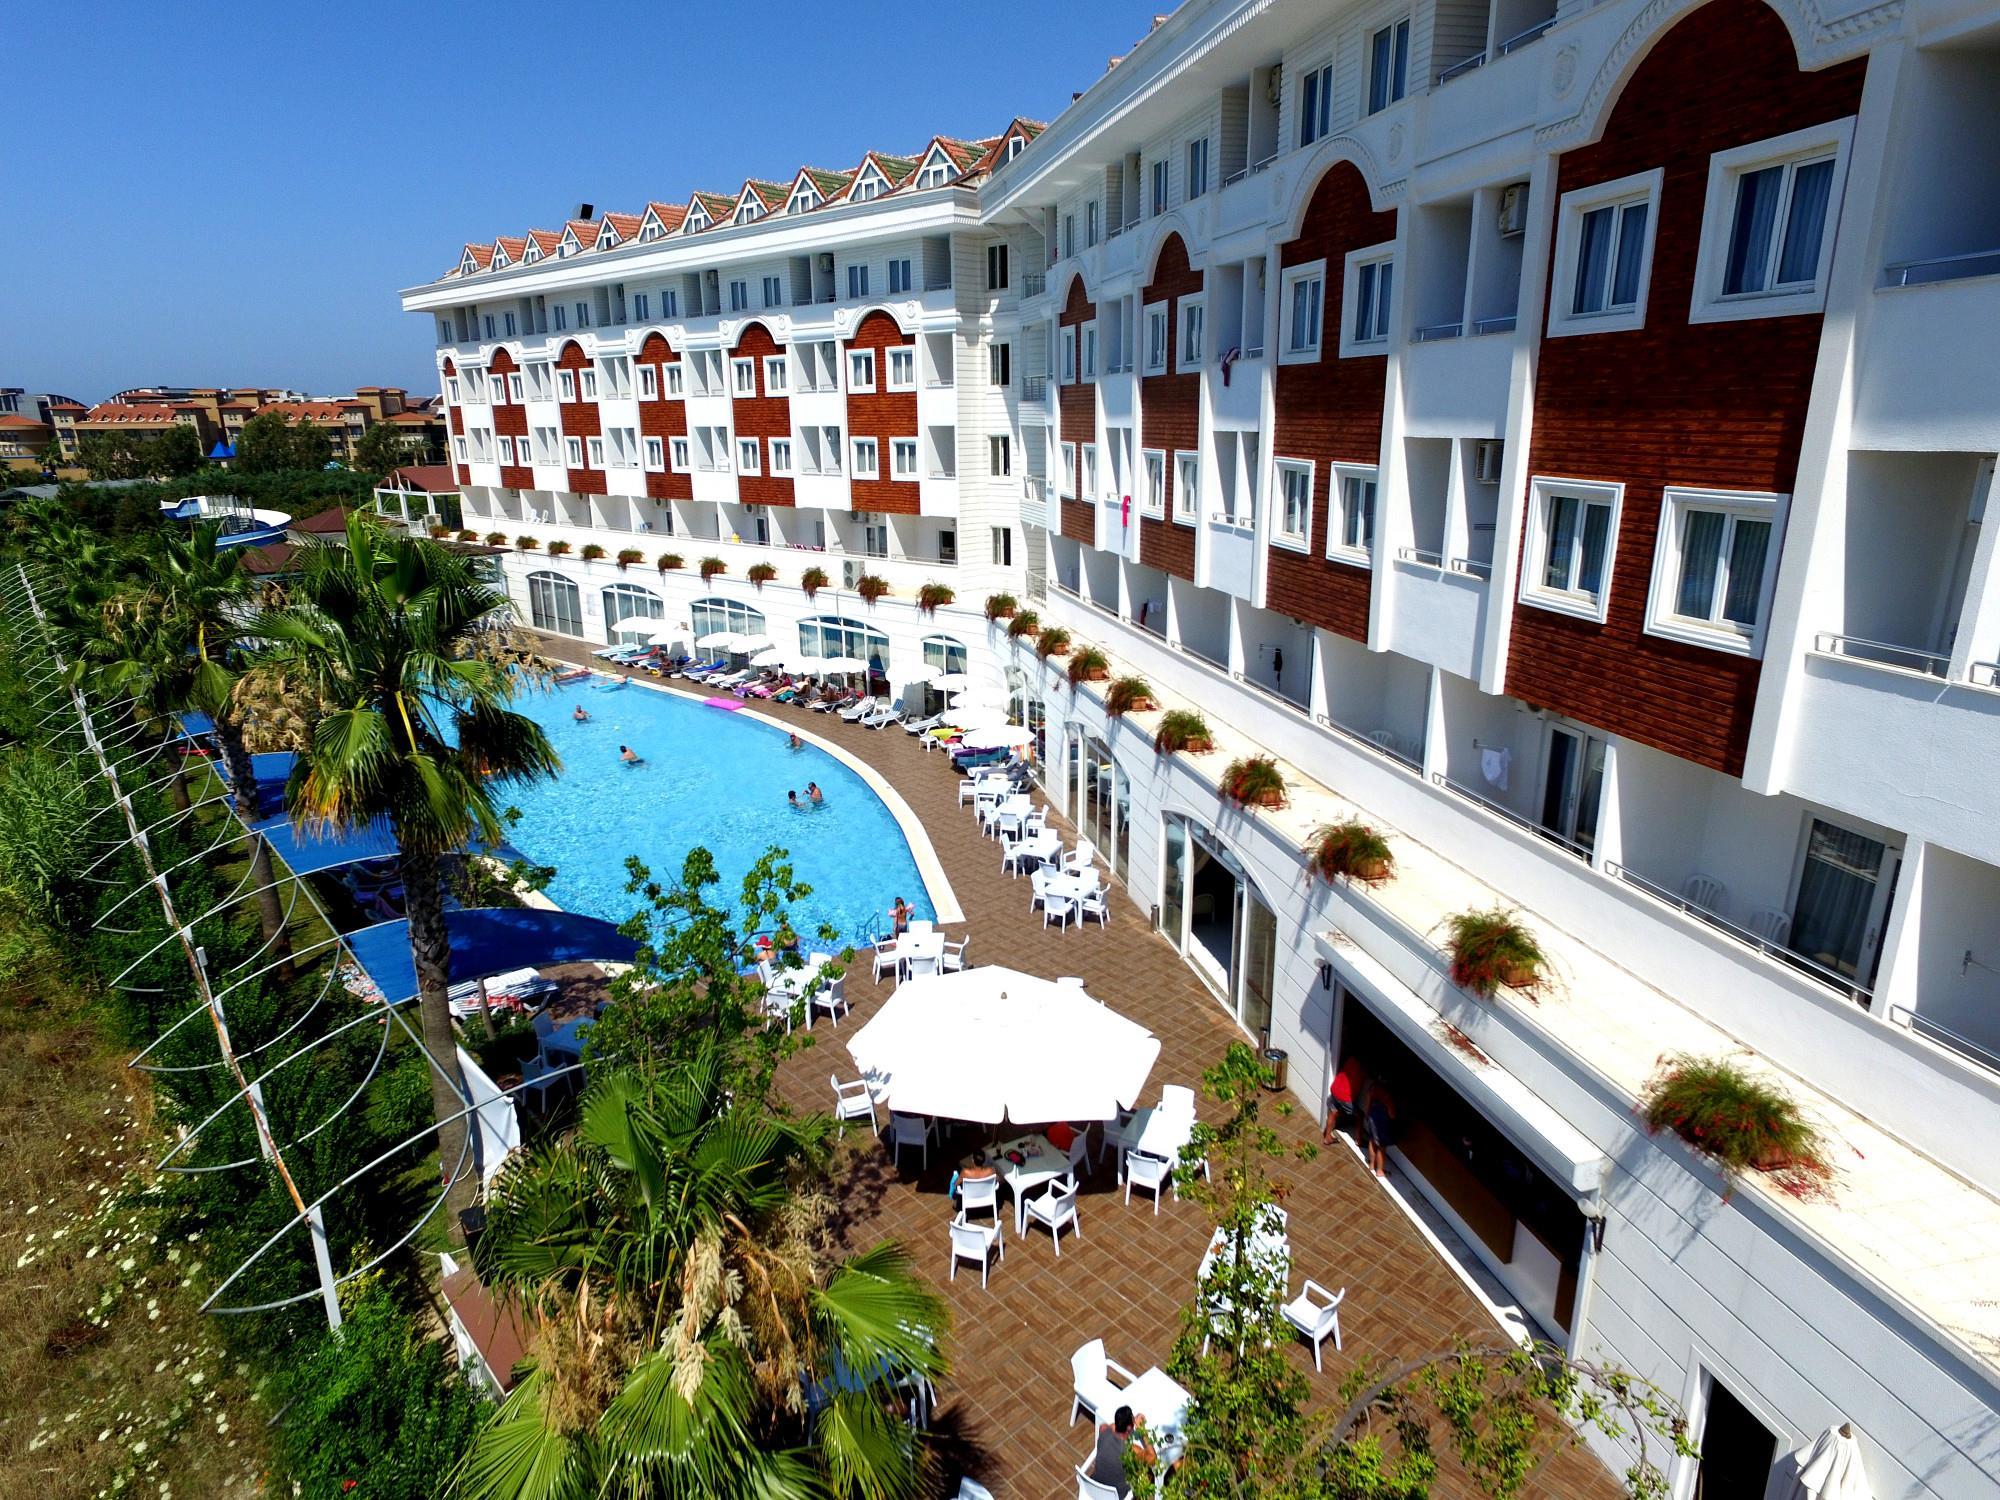 http://www.orextravel.sk/OREX/hotelphotos/side-royal-paradise-general-0016.jpg